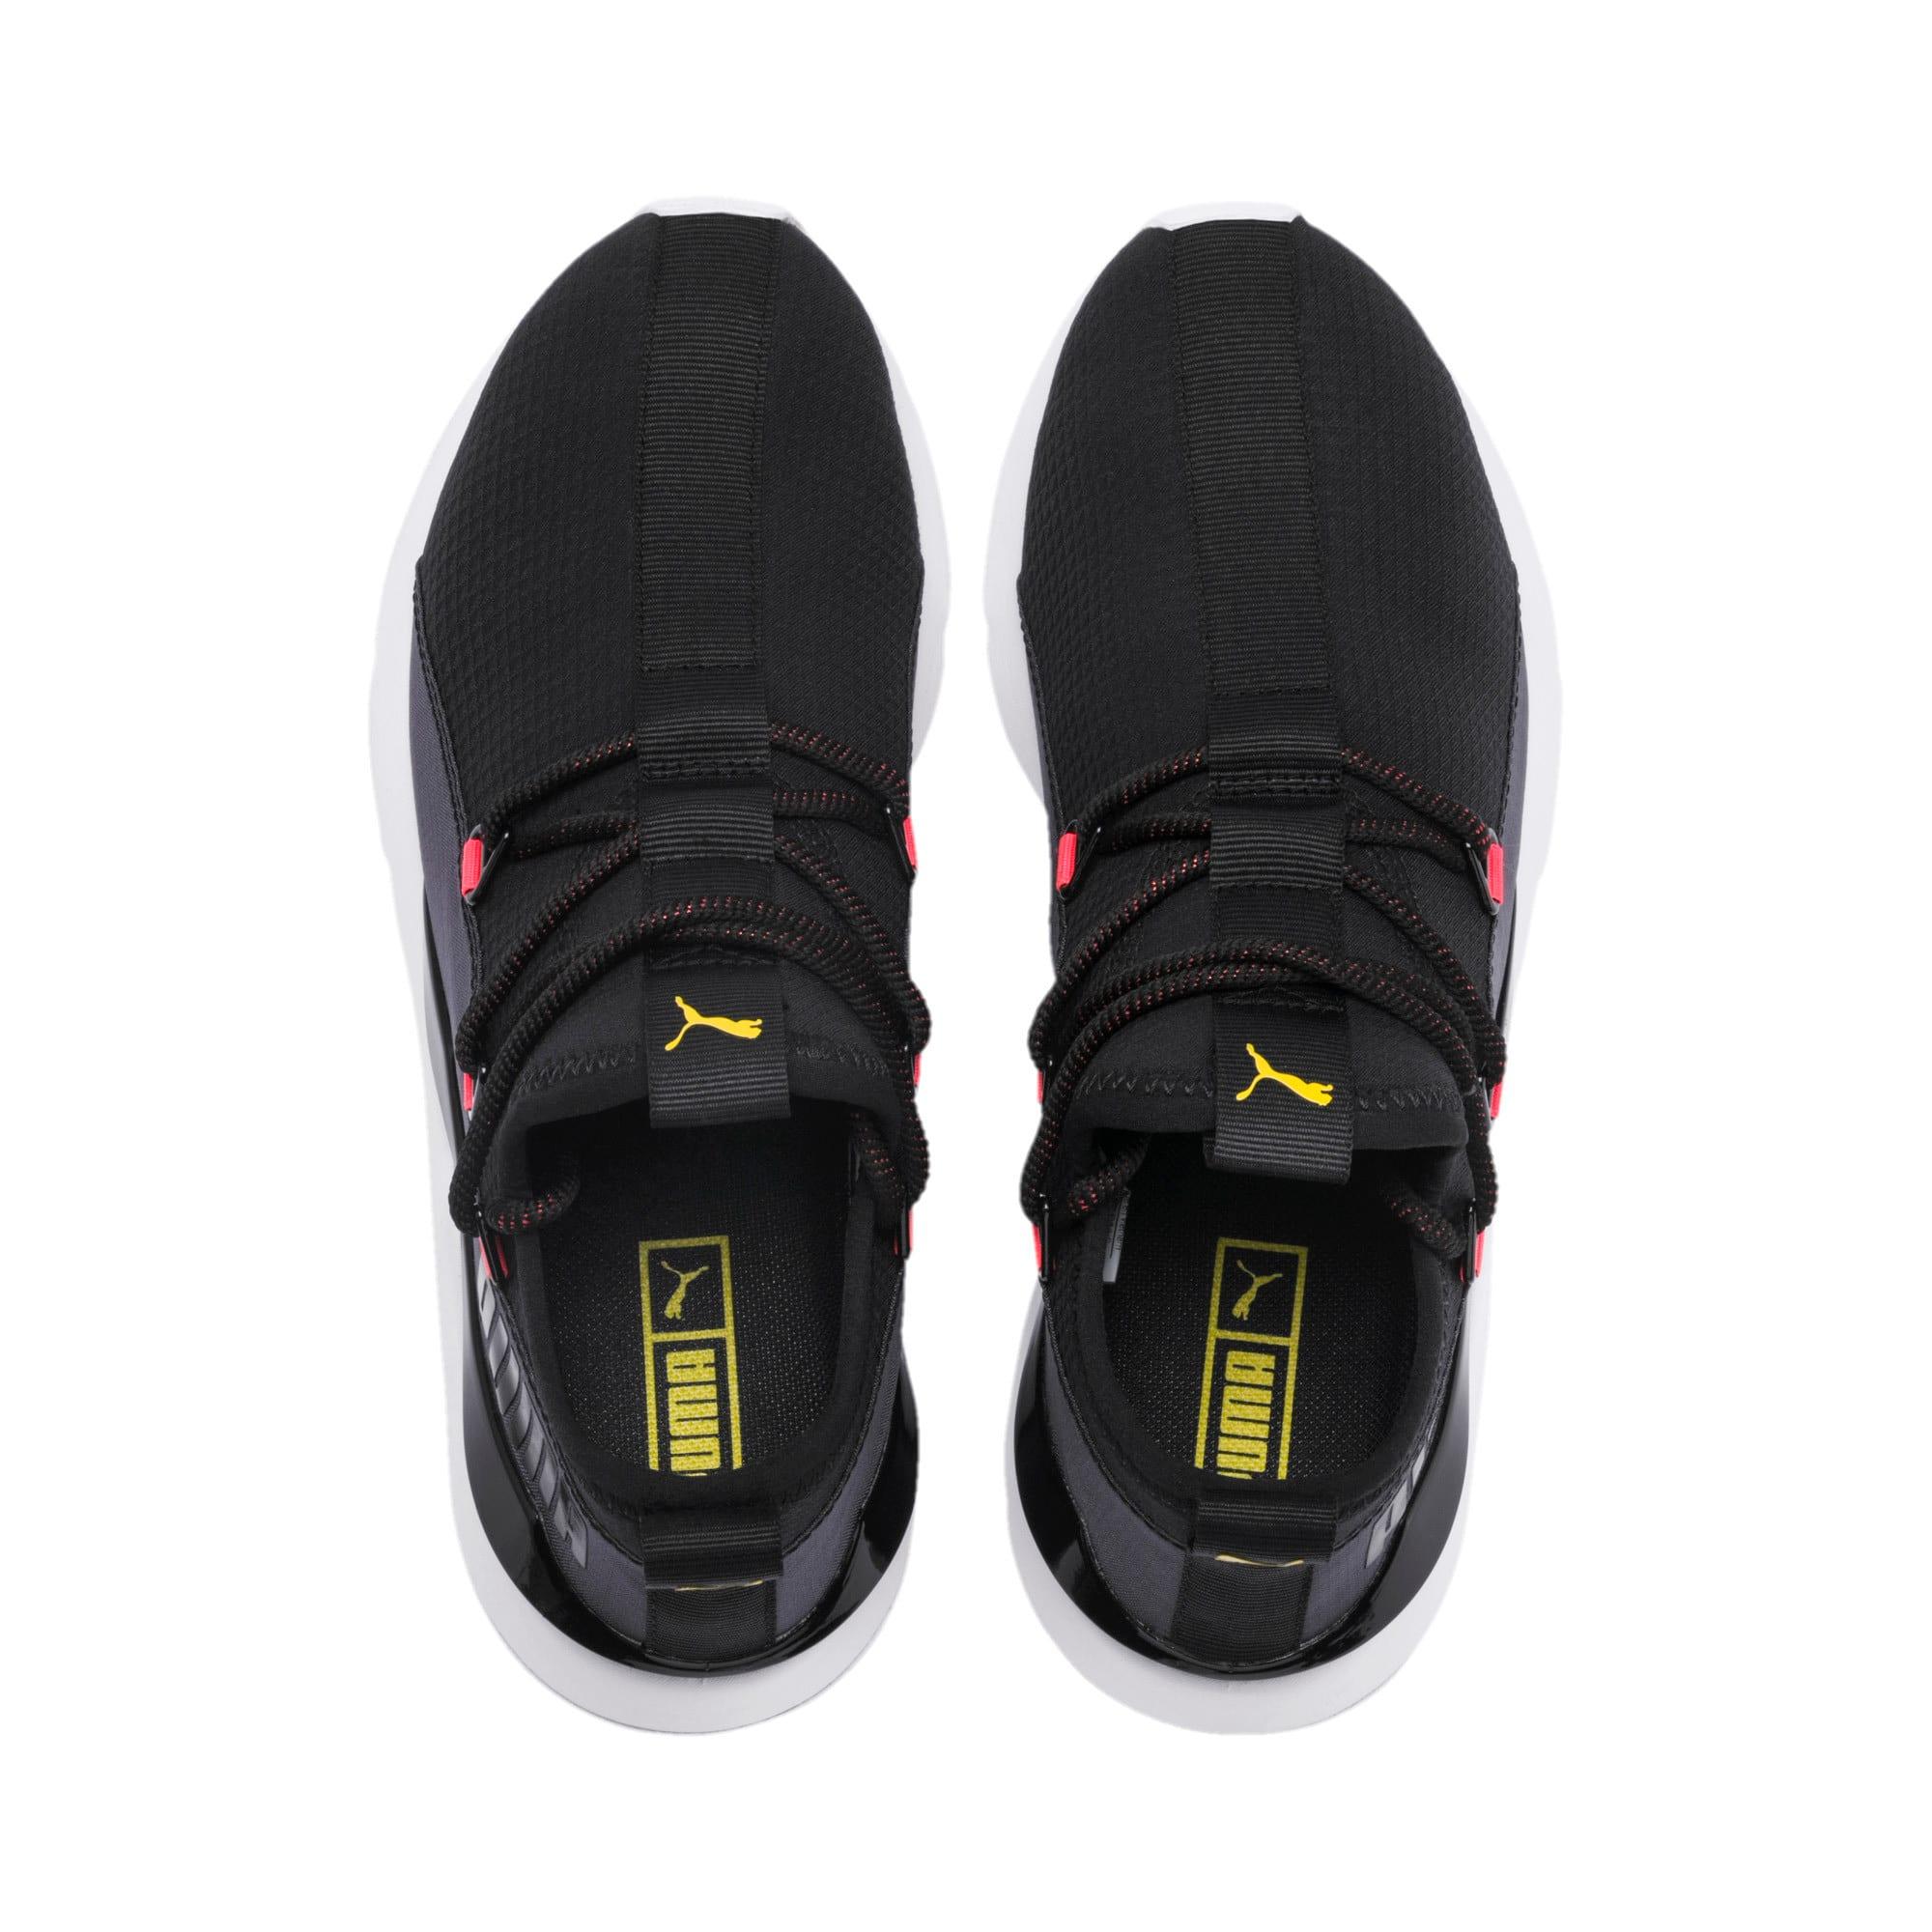 Thumbnail 7 of Muse 2 Hypertech Women's Sneakers, Puma Black-Sulphur, medium